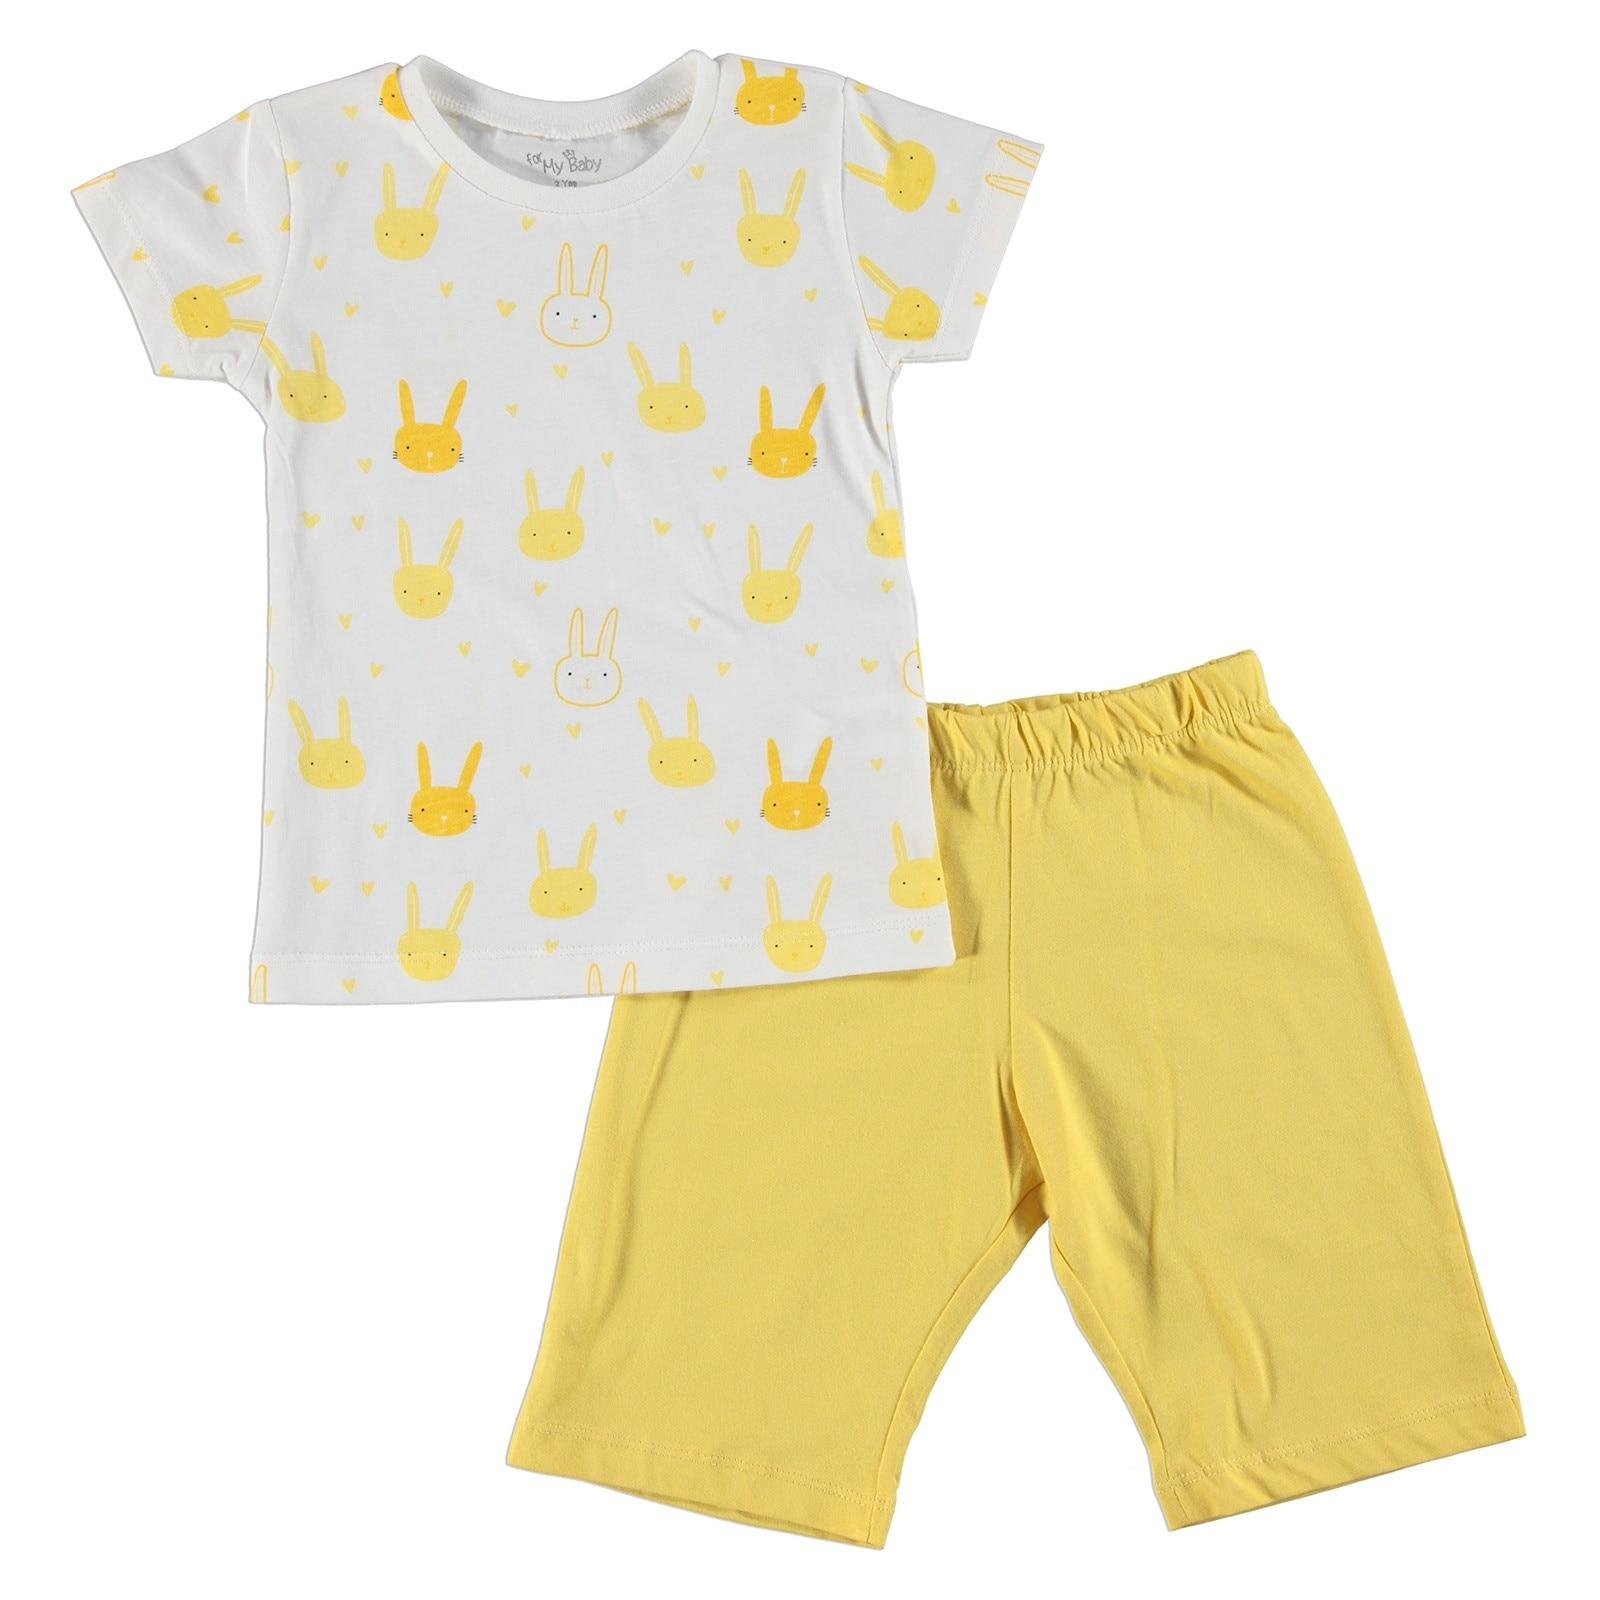 Ebebek For My Baby Hearted Rabbit Feature Printed Short Sleeve Girl Pyjamas